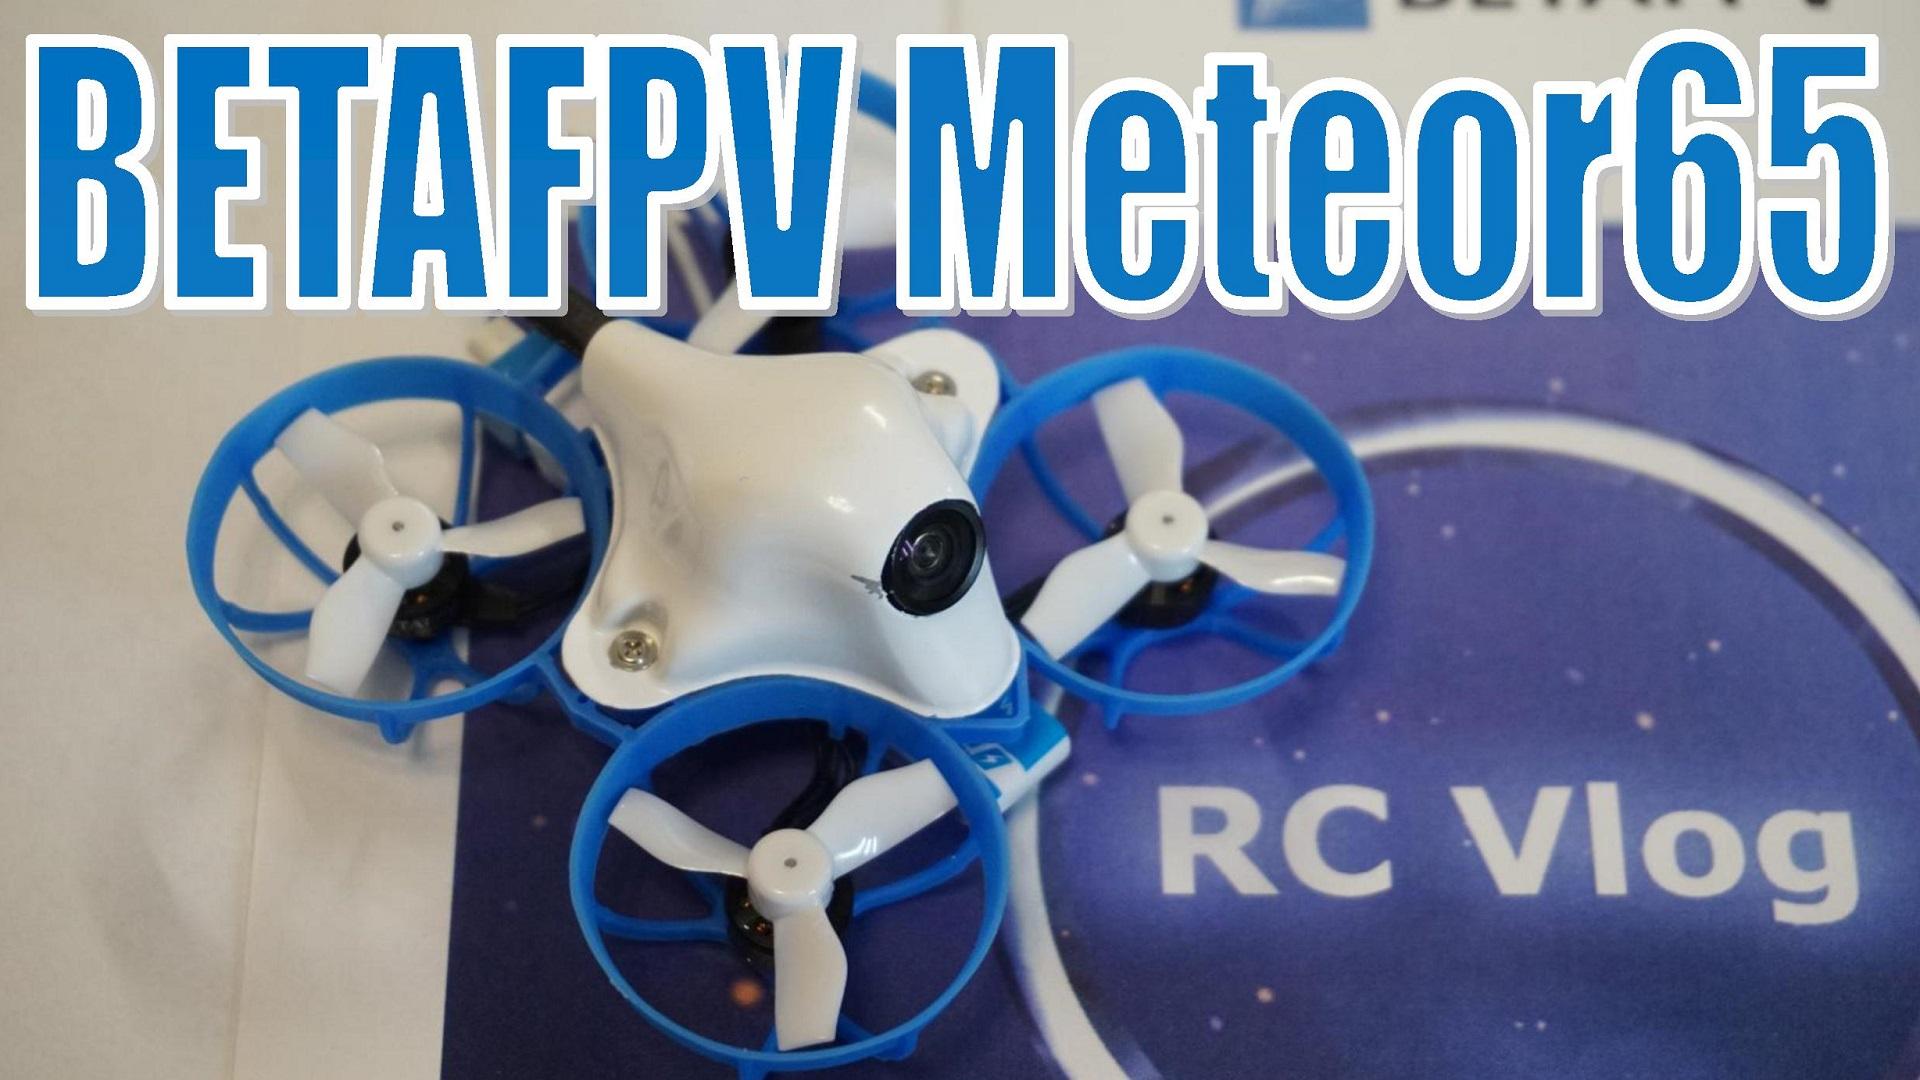 BETAFPV Meteor65 Brushless Whoop Quadcopter